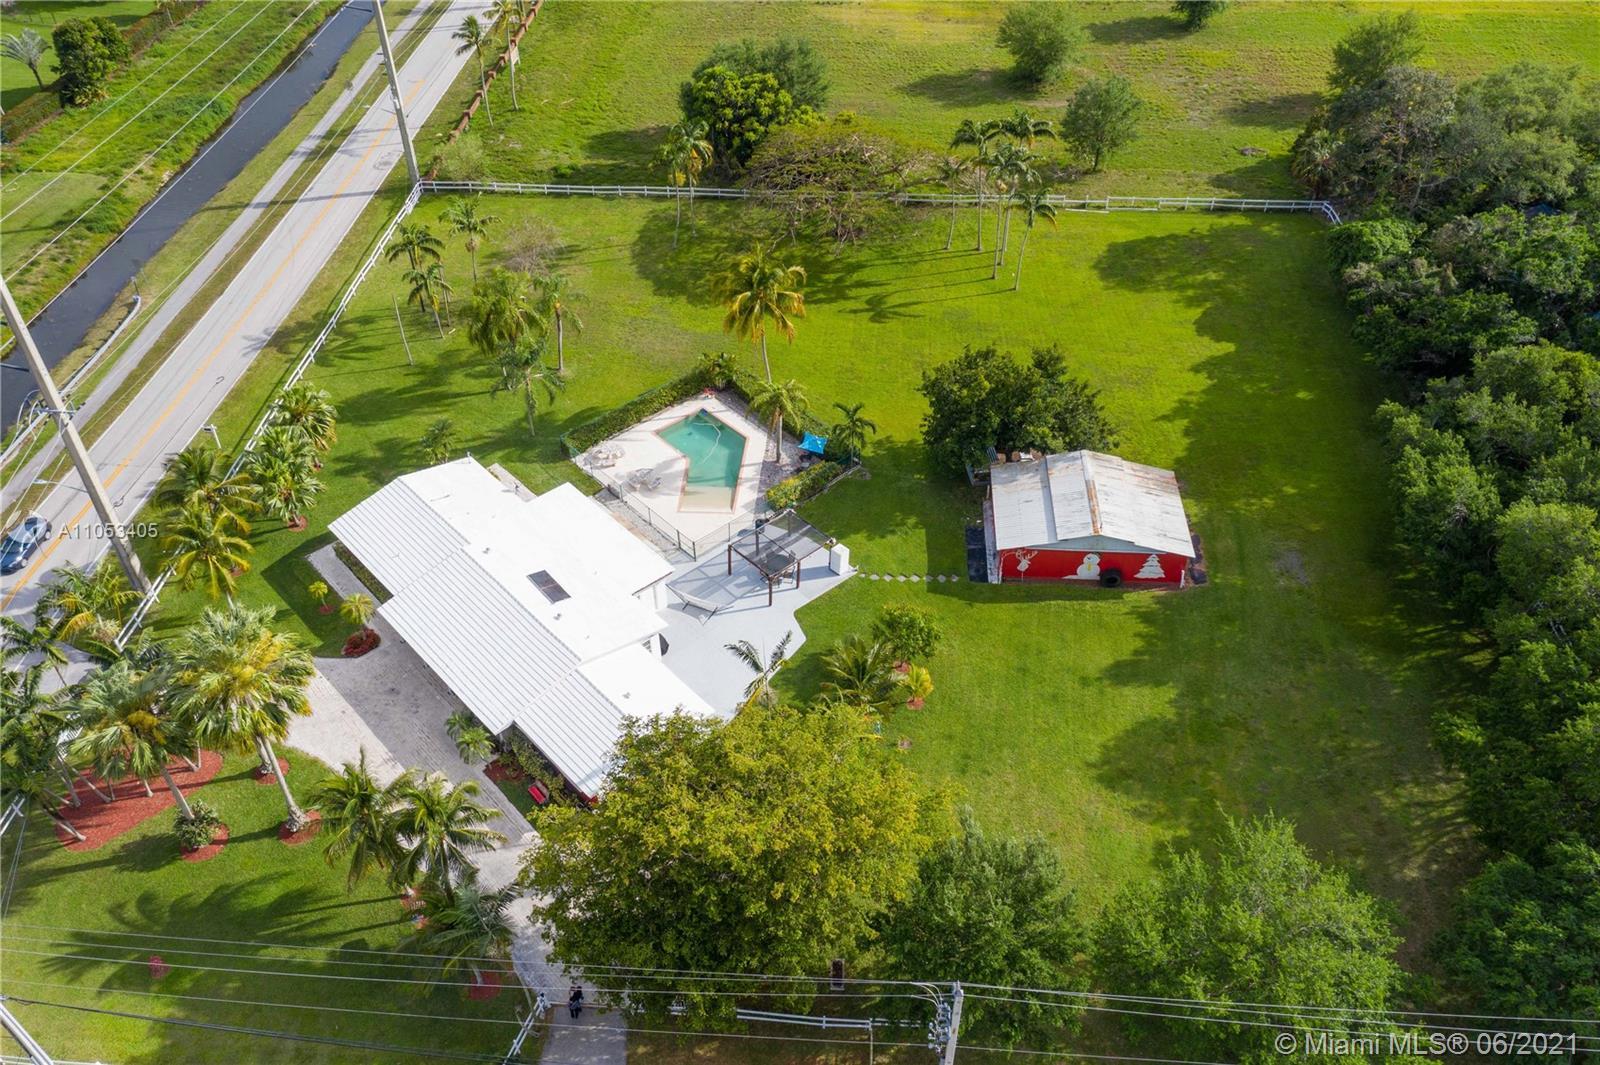 FLA Fruit Lands, 1401 SW 136th Ave, Davie, Florida 33325